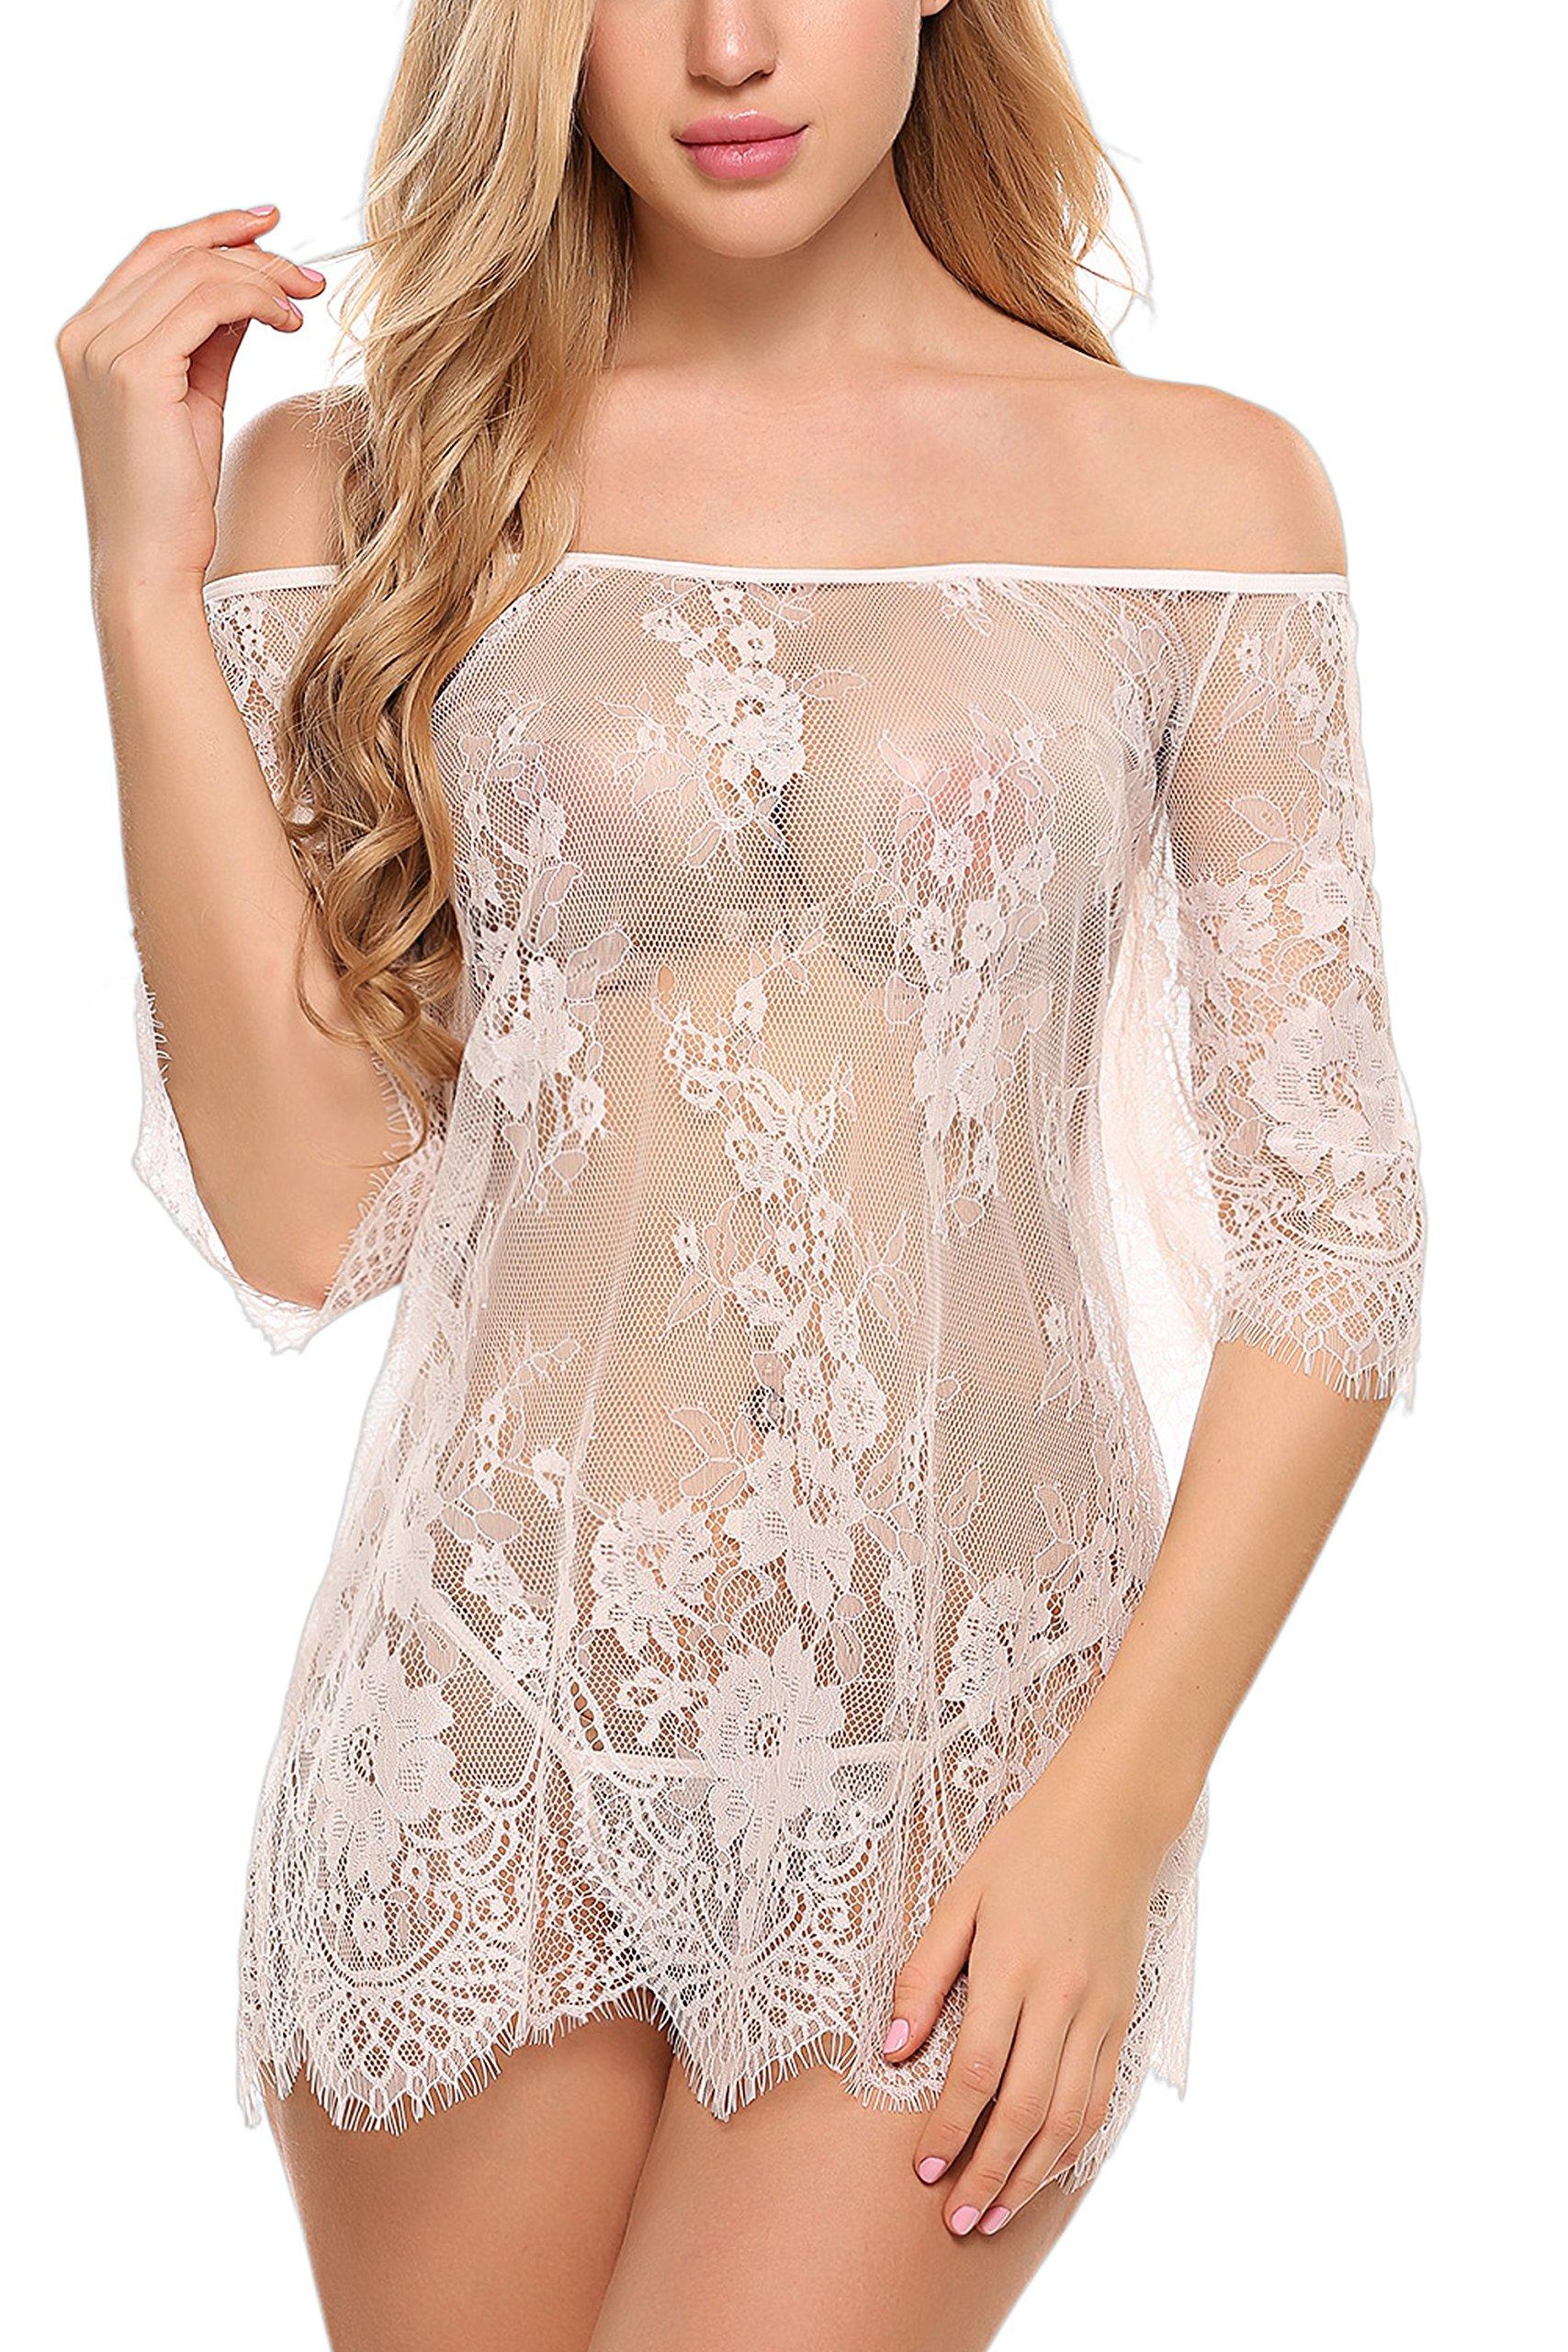 Avidlove Women Chemises Lace Smock Sexy Lingerie Mini Babydoll Mesh Nightgown White Small